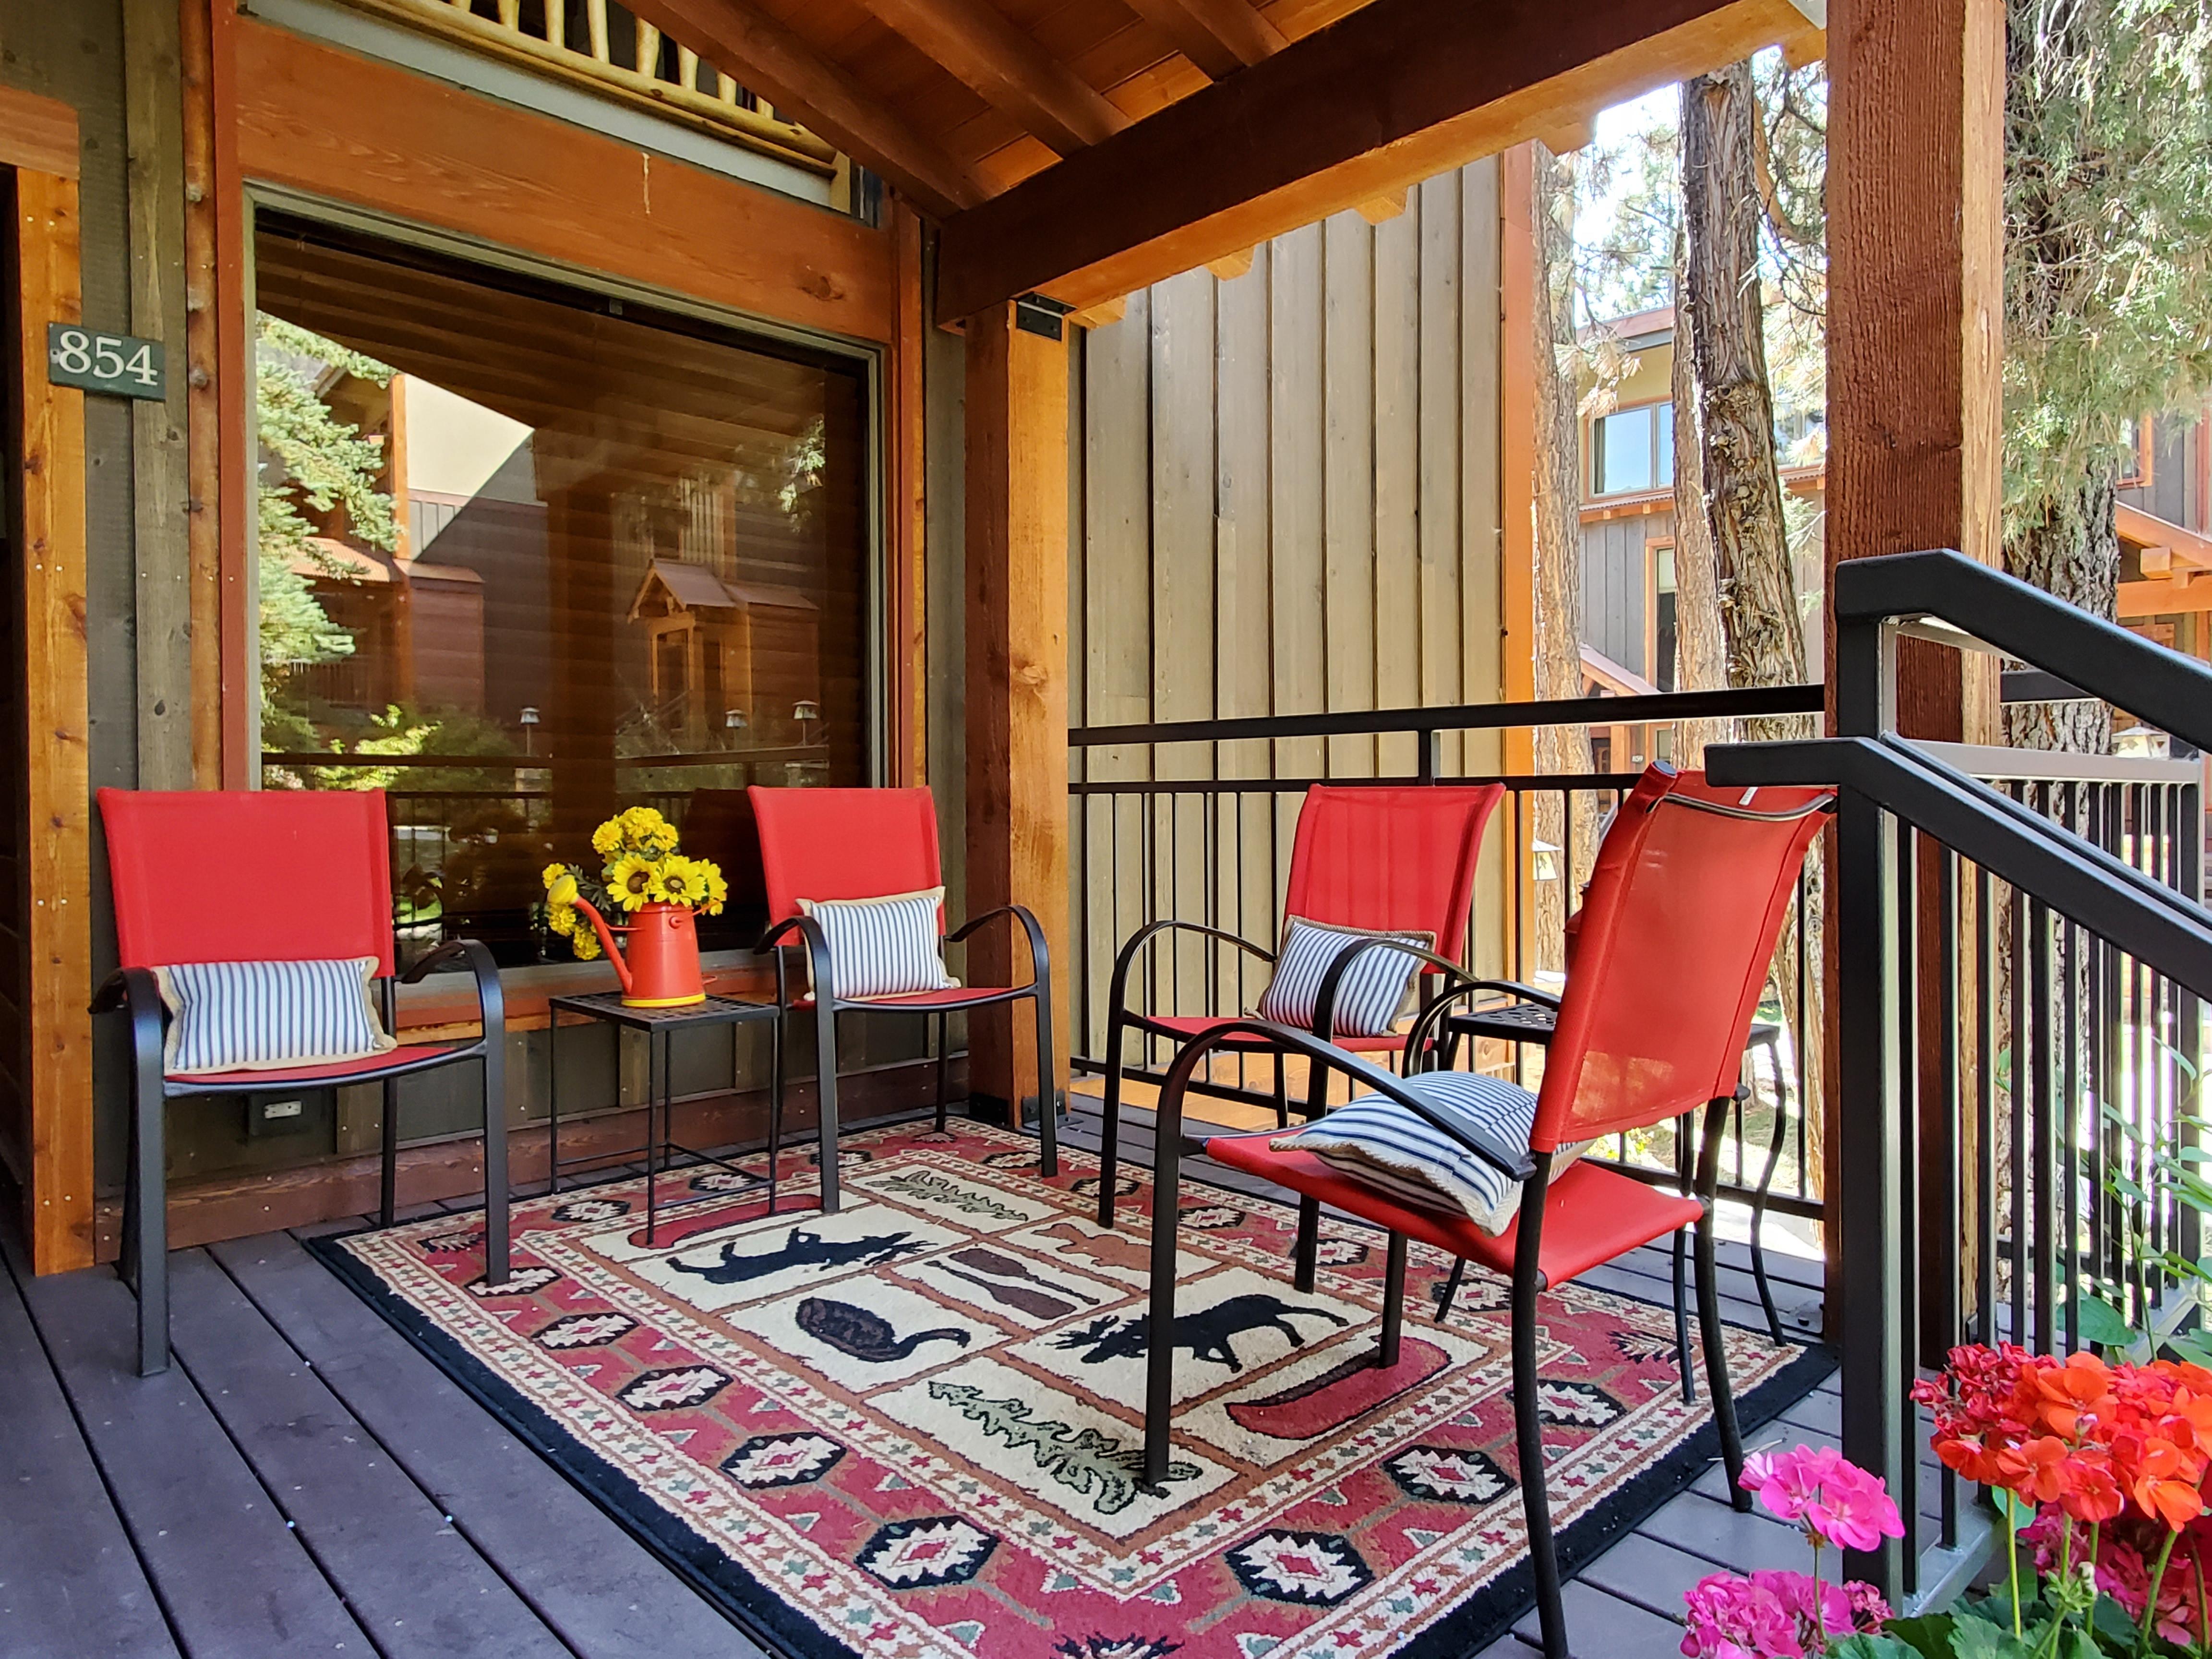 Tamarron Resort #854 - Amid the Pines - Golf - AC/Pool/HotTub - Ski Shuttle